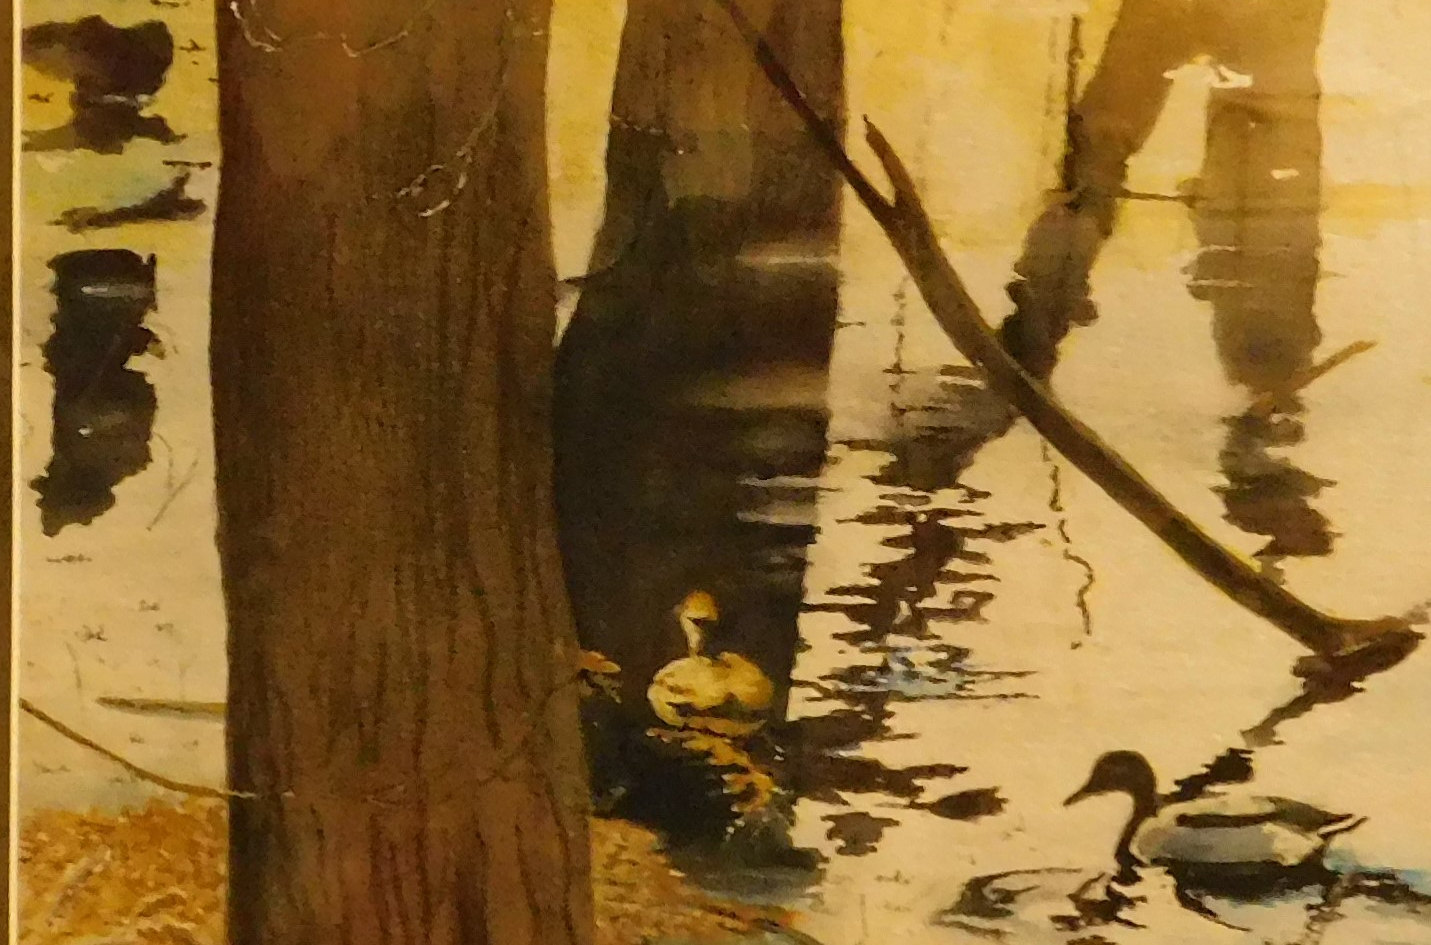 PUDDLE DUCKS Jack Keefe Watercolour 26x2